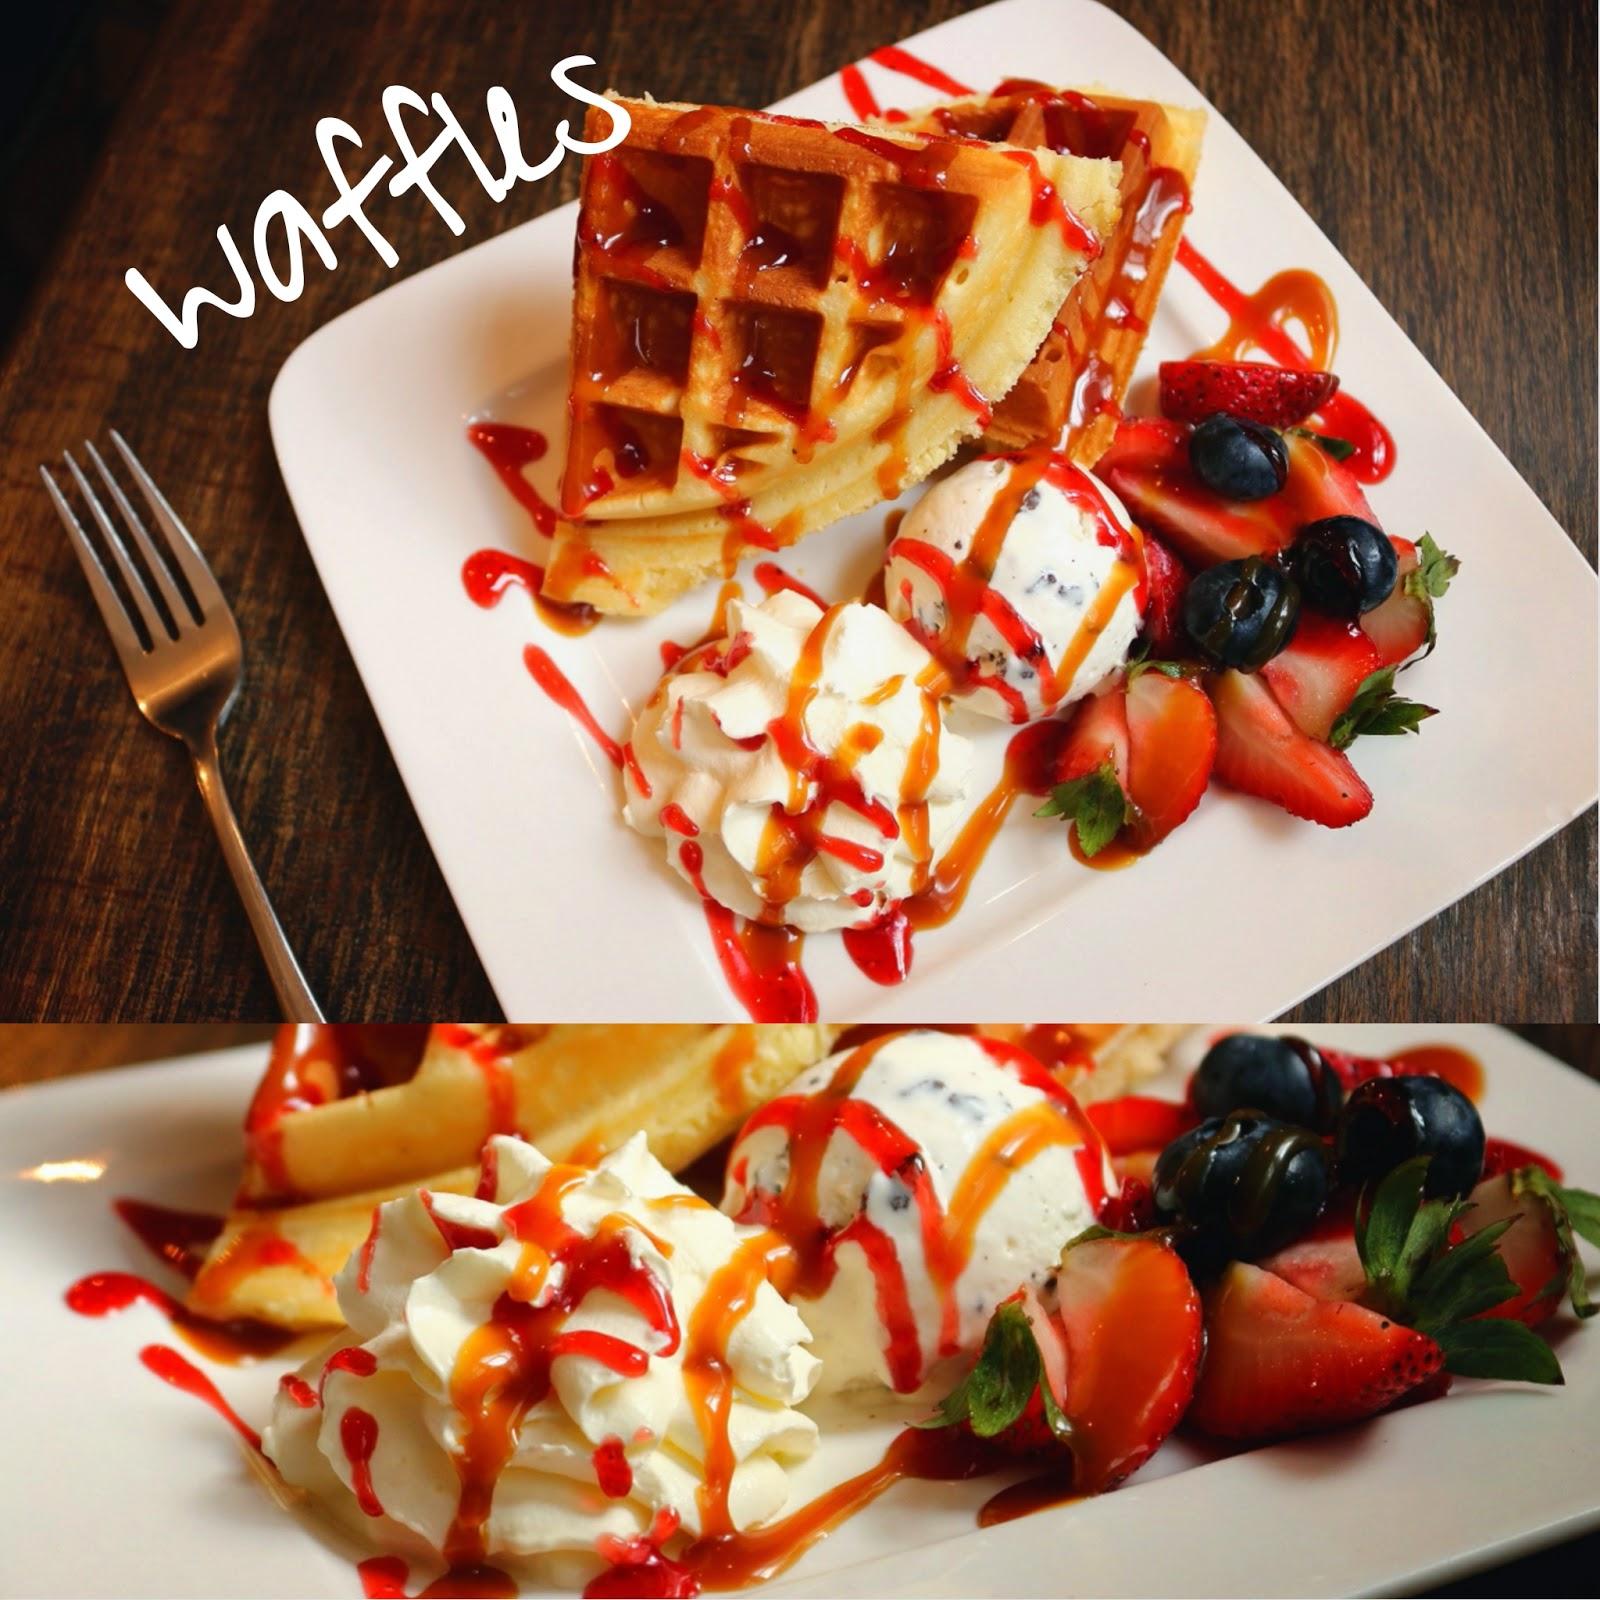 PND純粹分享。愛玩愛食。: Barista Caffe - 野莓窩夫配咖啡!